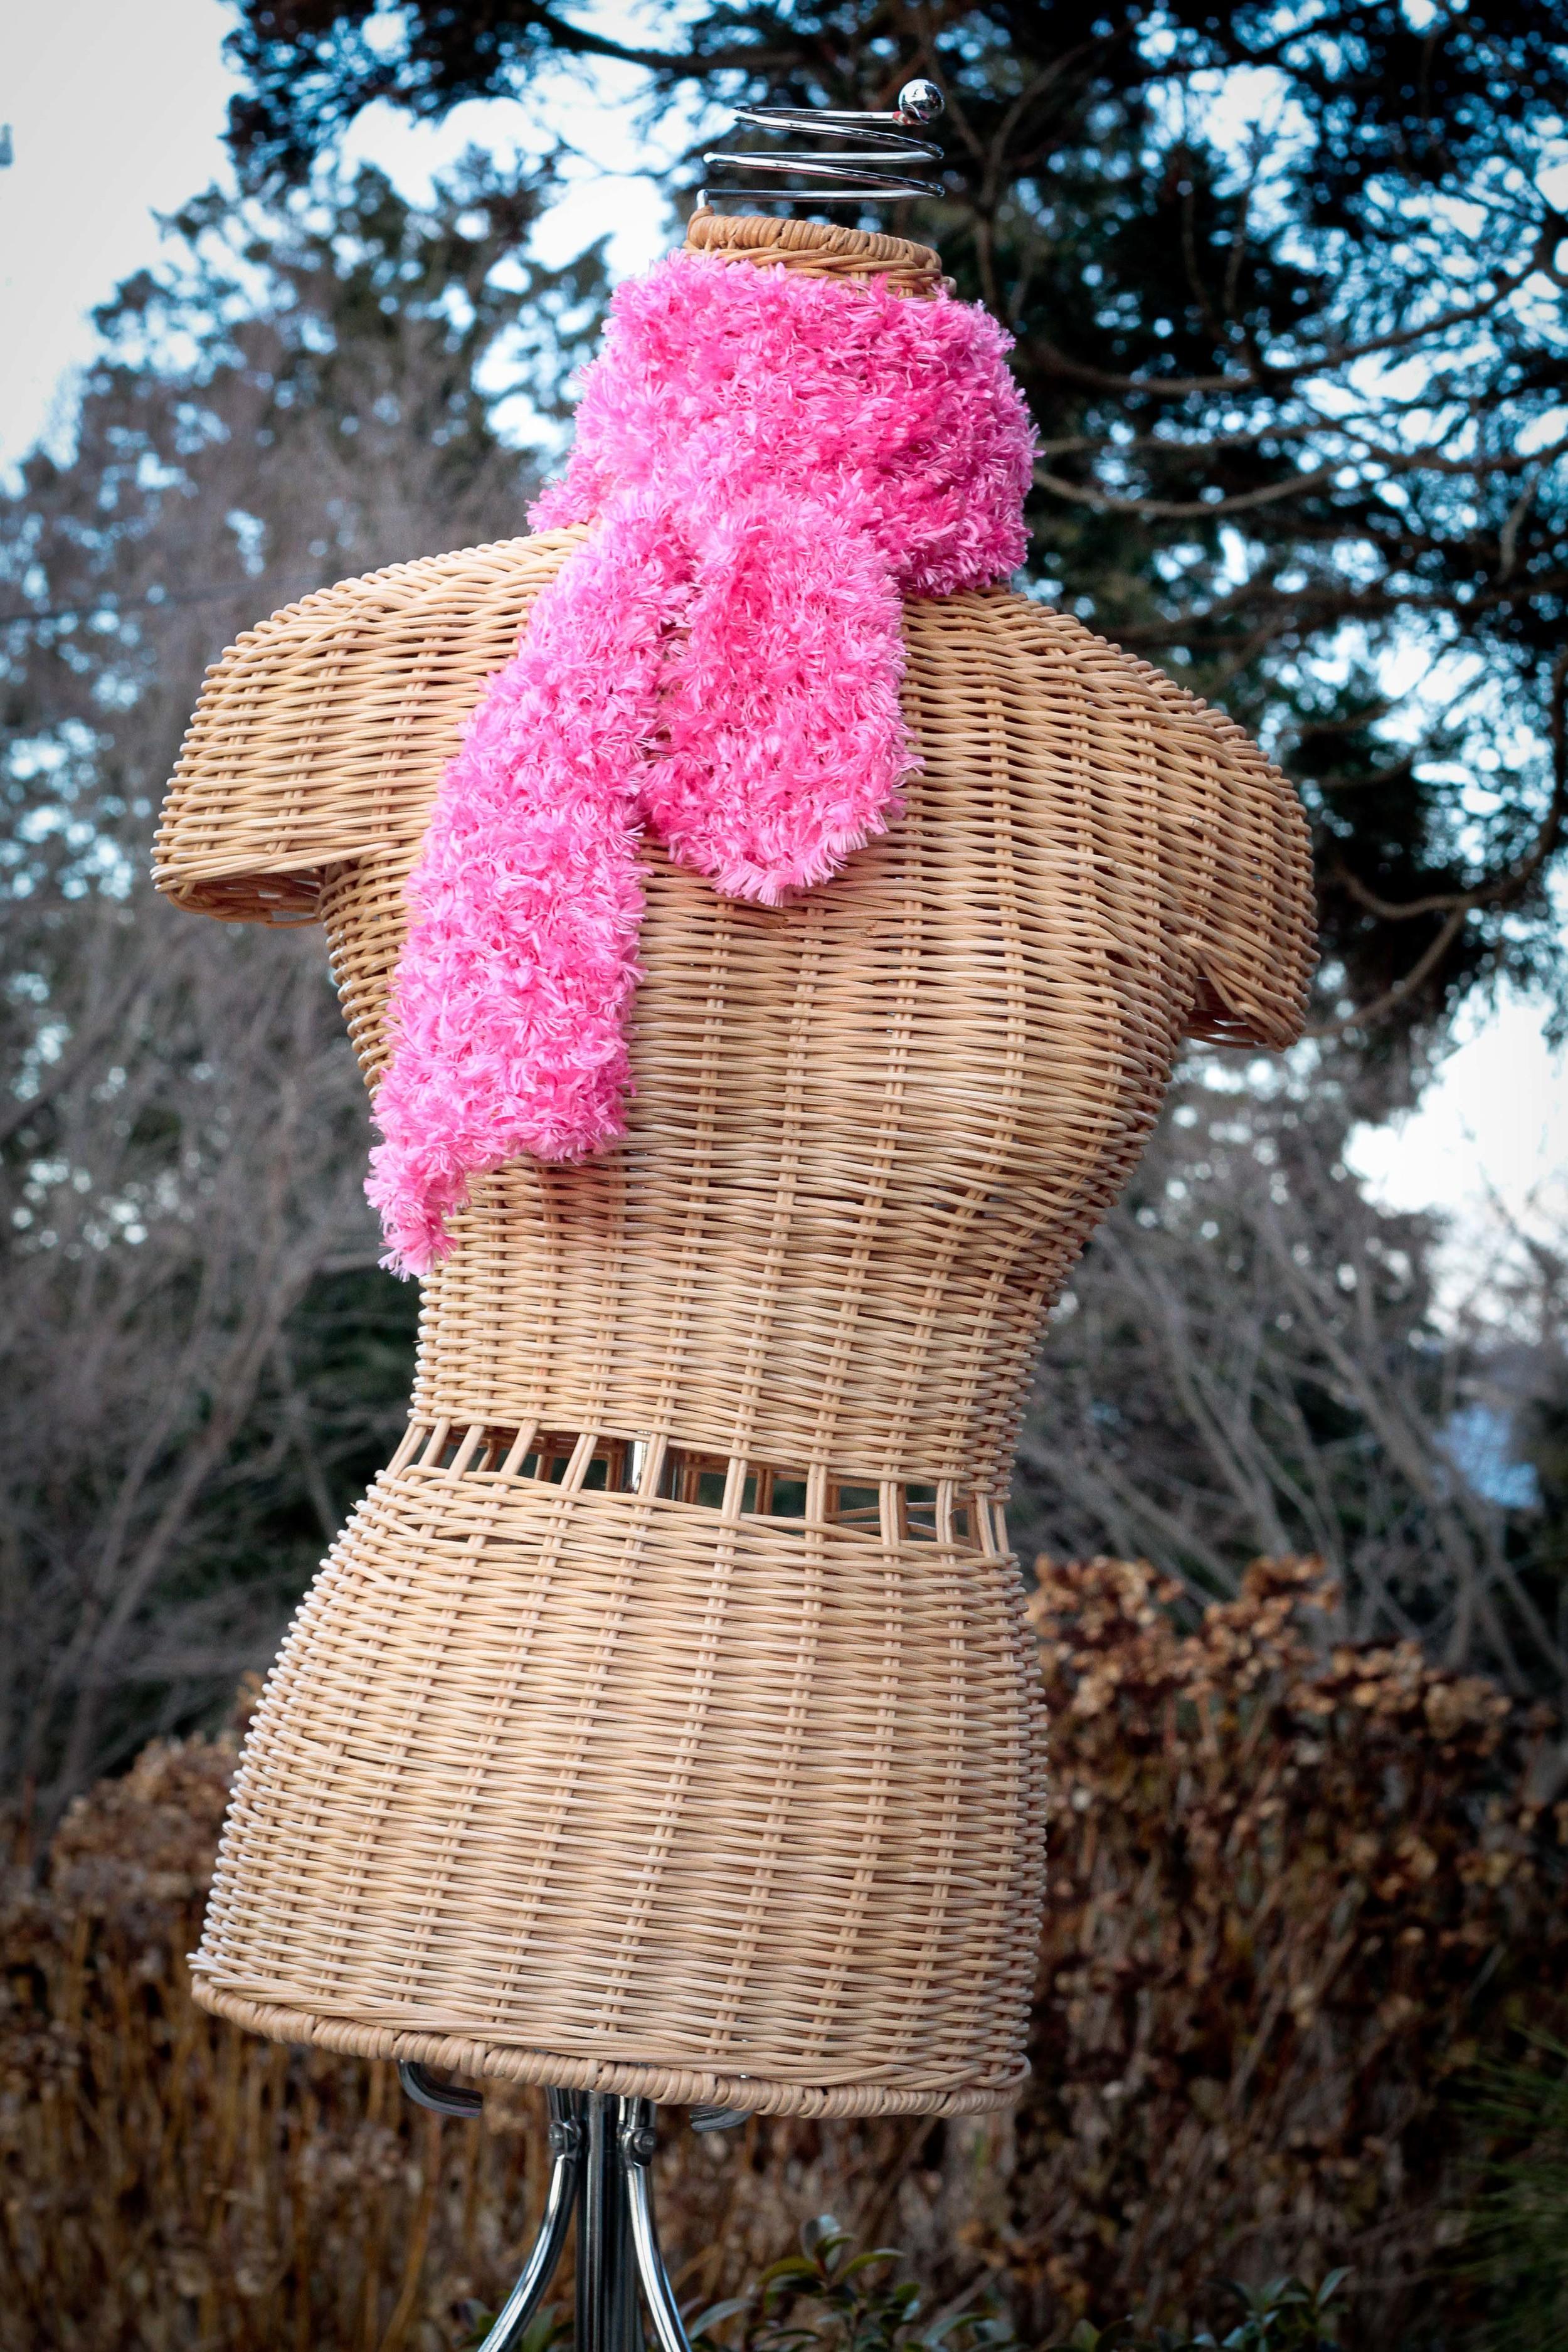 Pink boa knit scarf